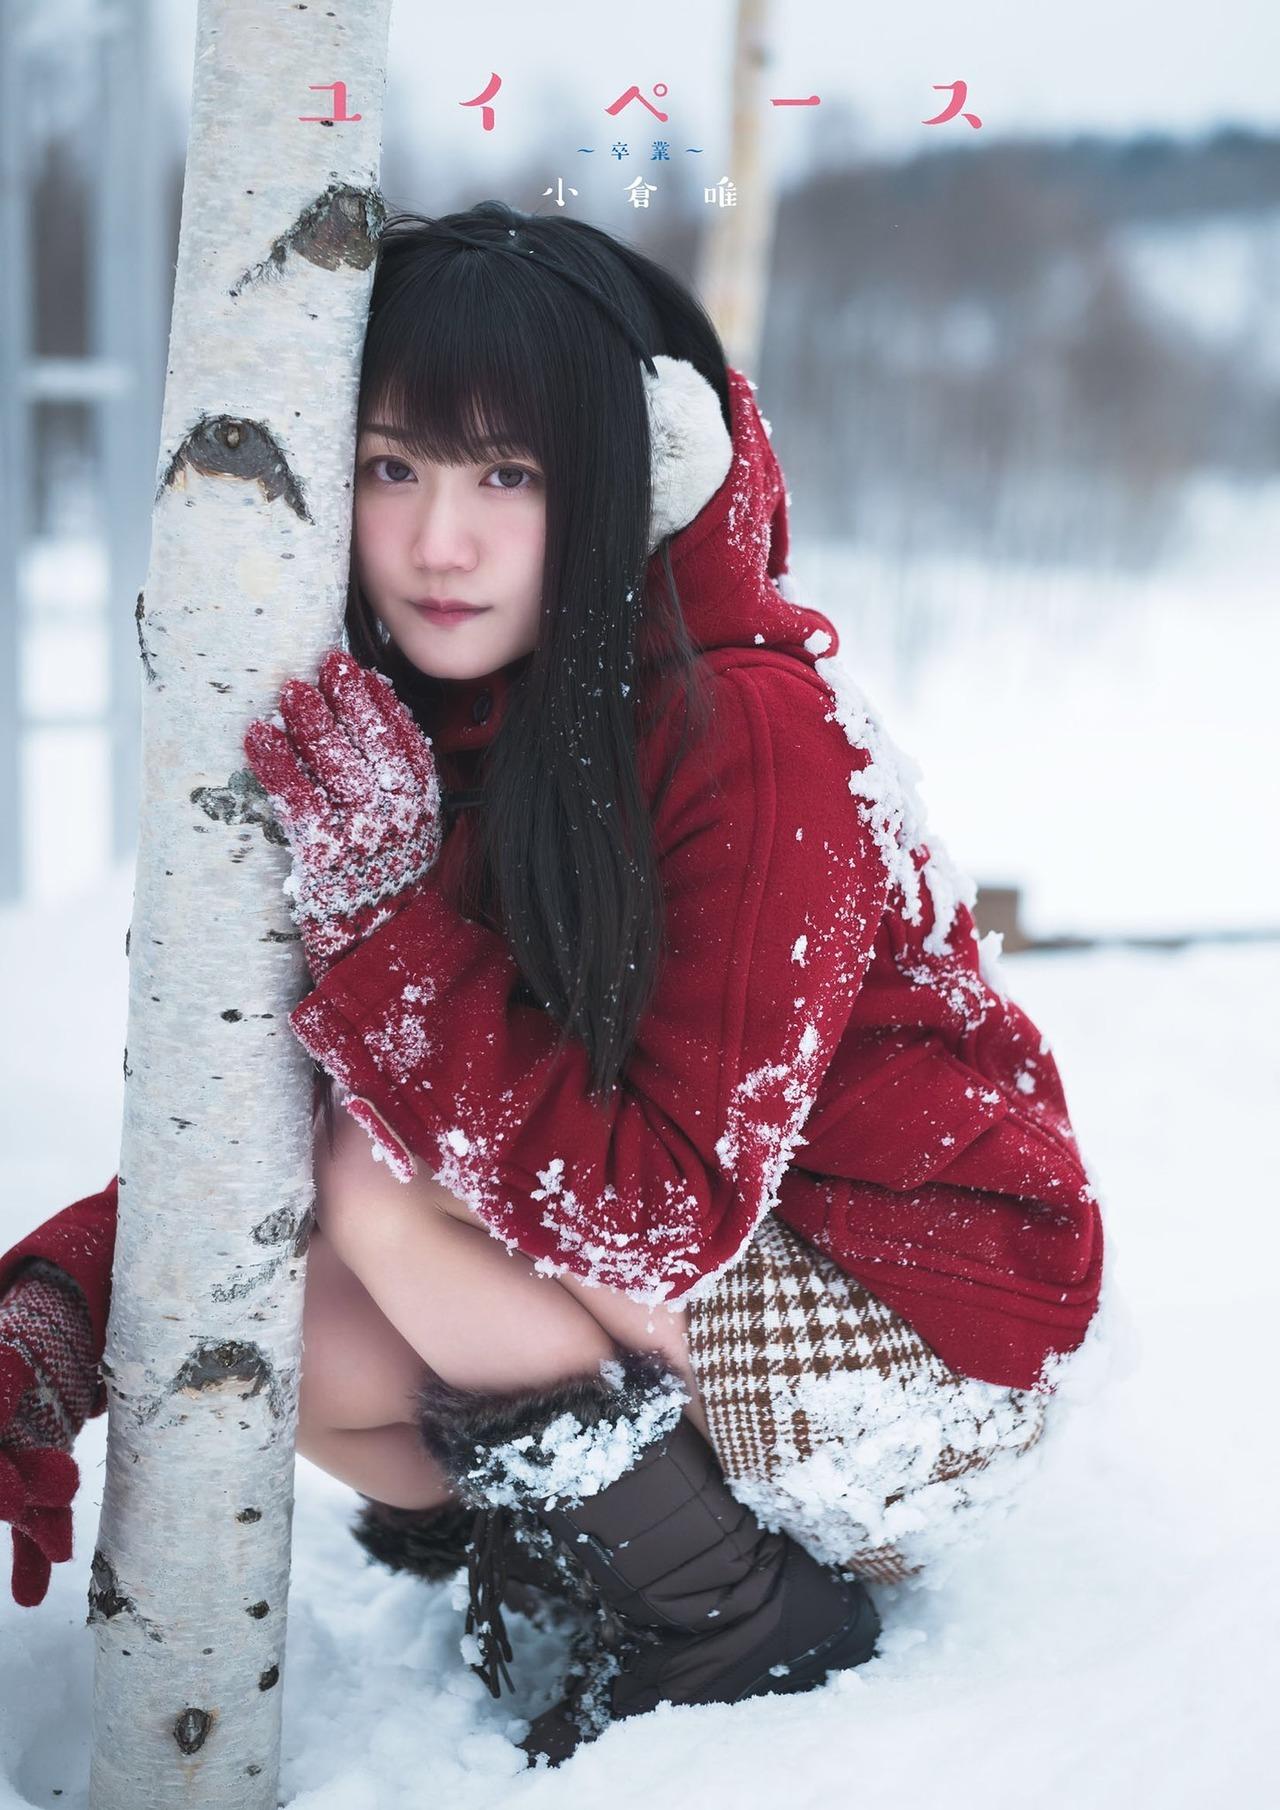 ogura_yui075.jpg